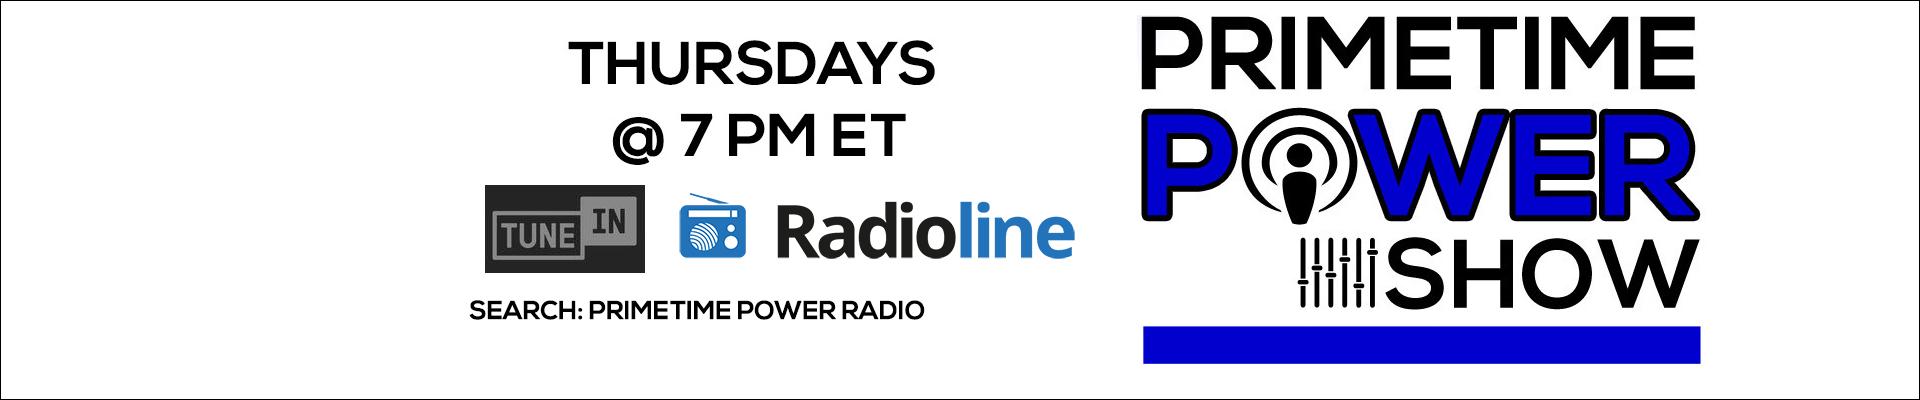 Primetime Power Show on Primetime Power Radio